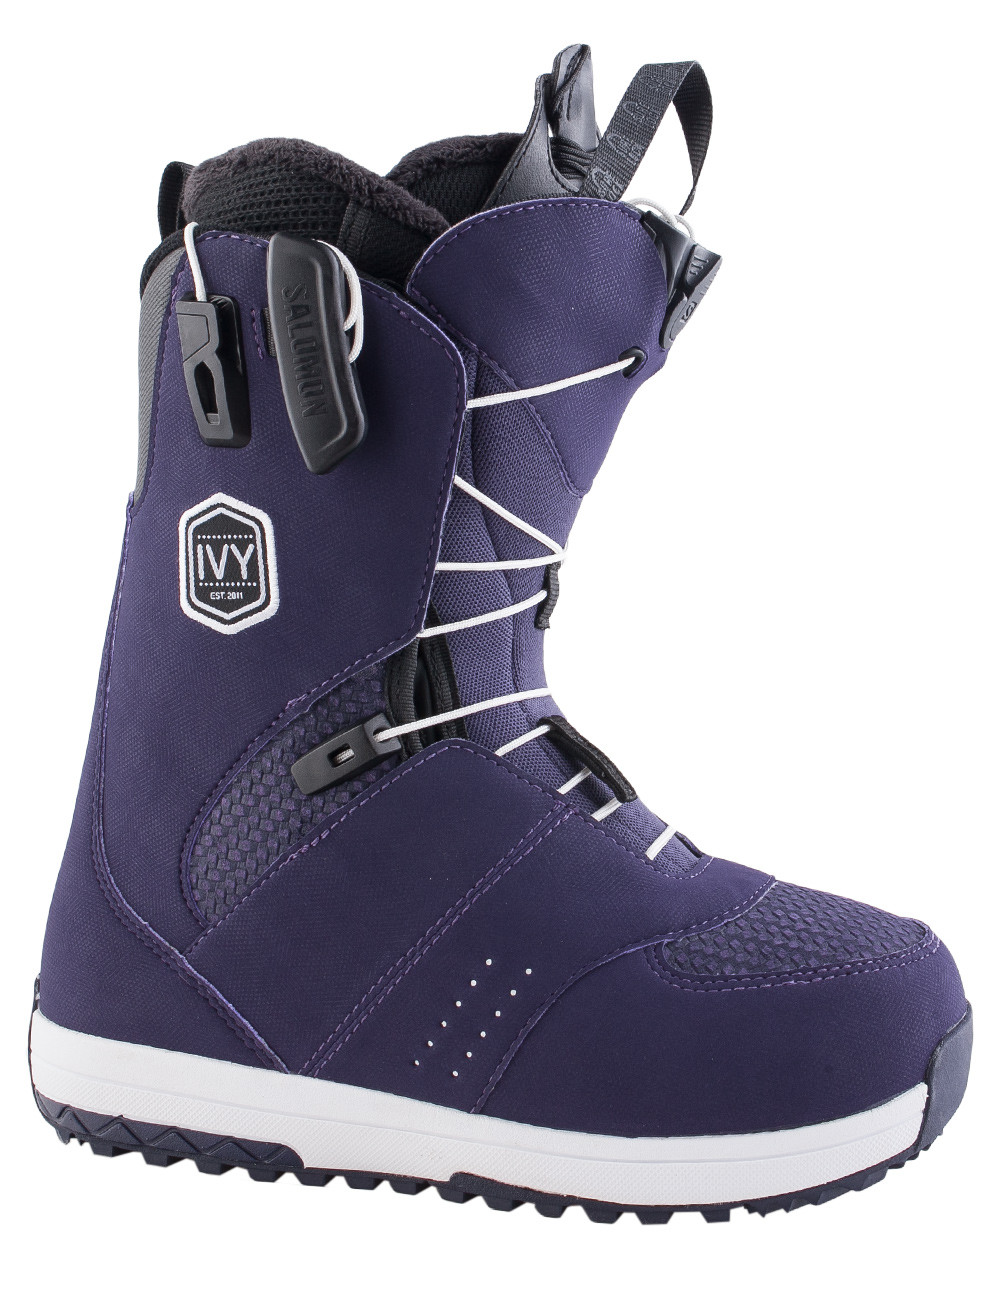 Buty snowboardowe Salomon Ivy Nightshade Grey | Silesia Sport